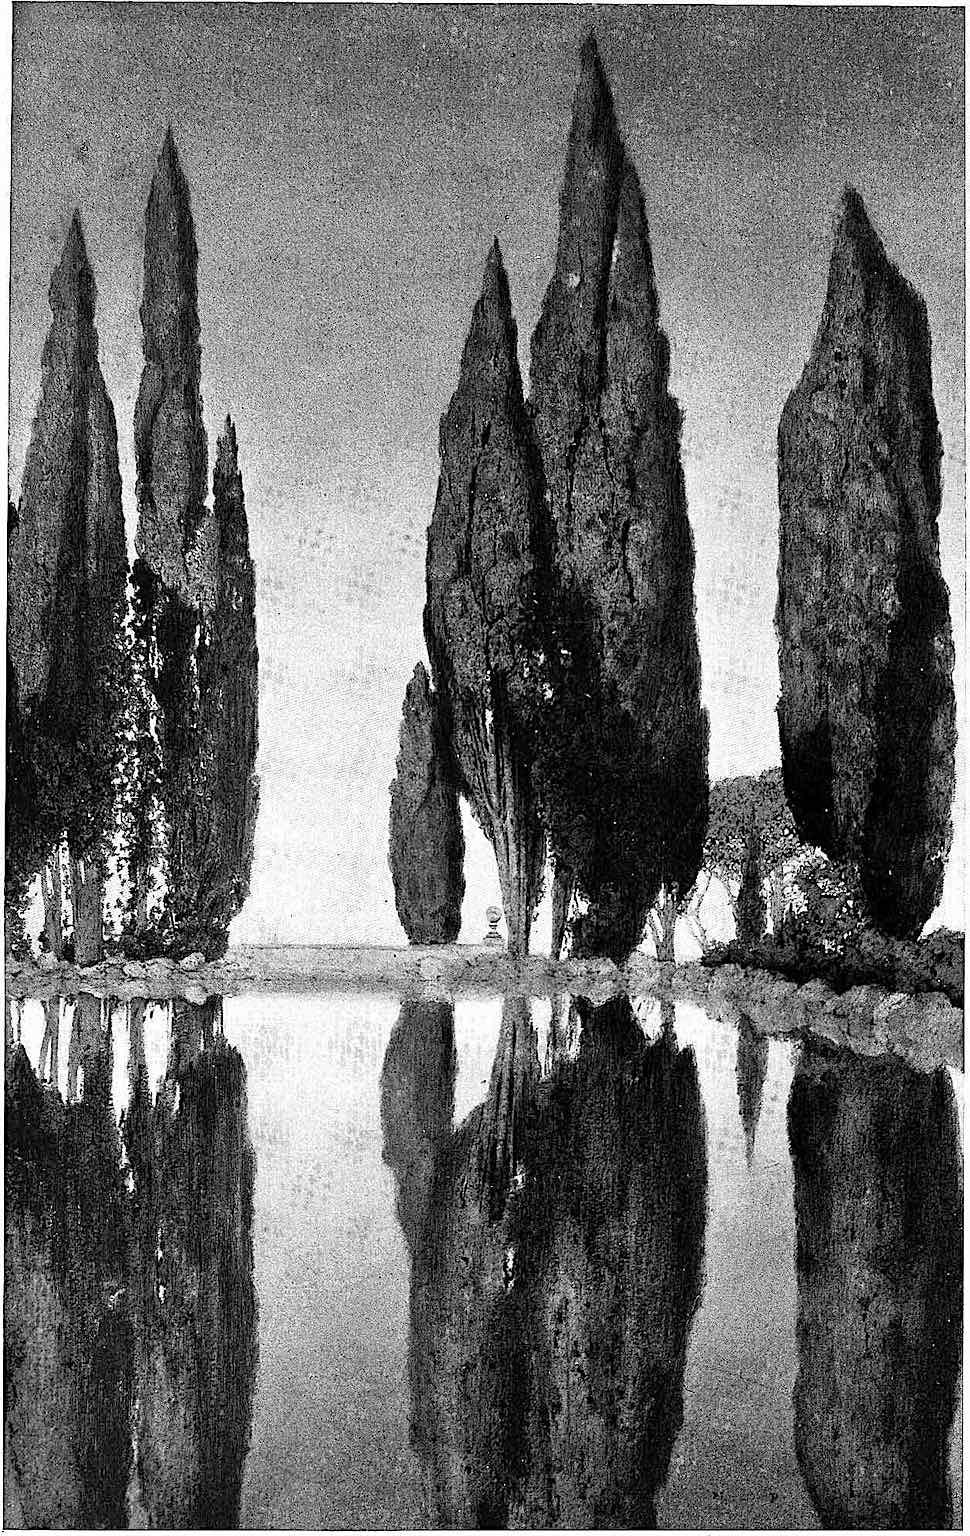 Maxfield Parrish 1904, trees at a still pond